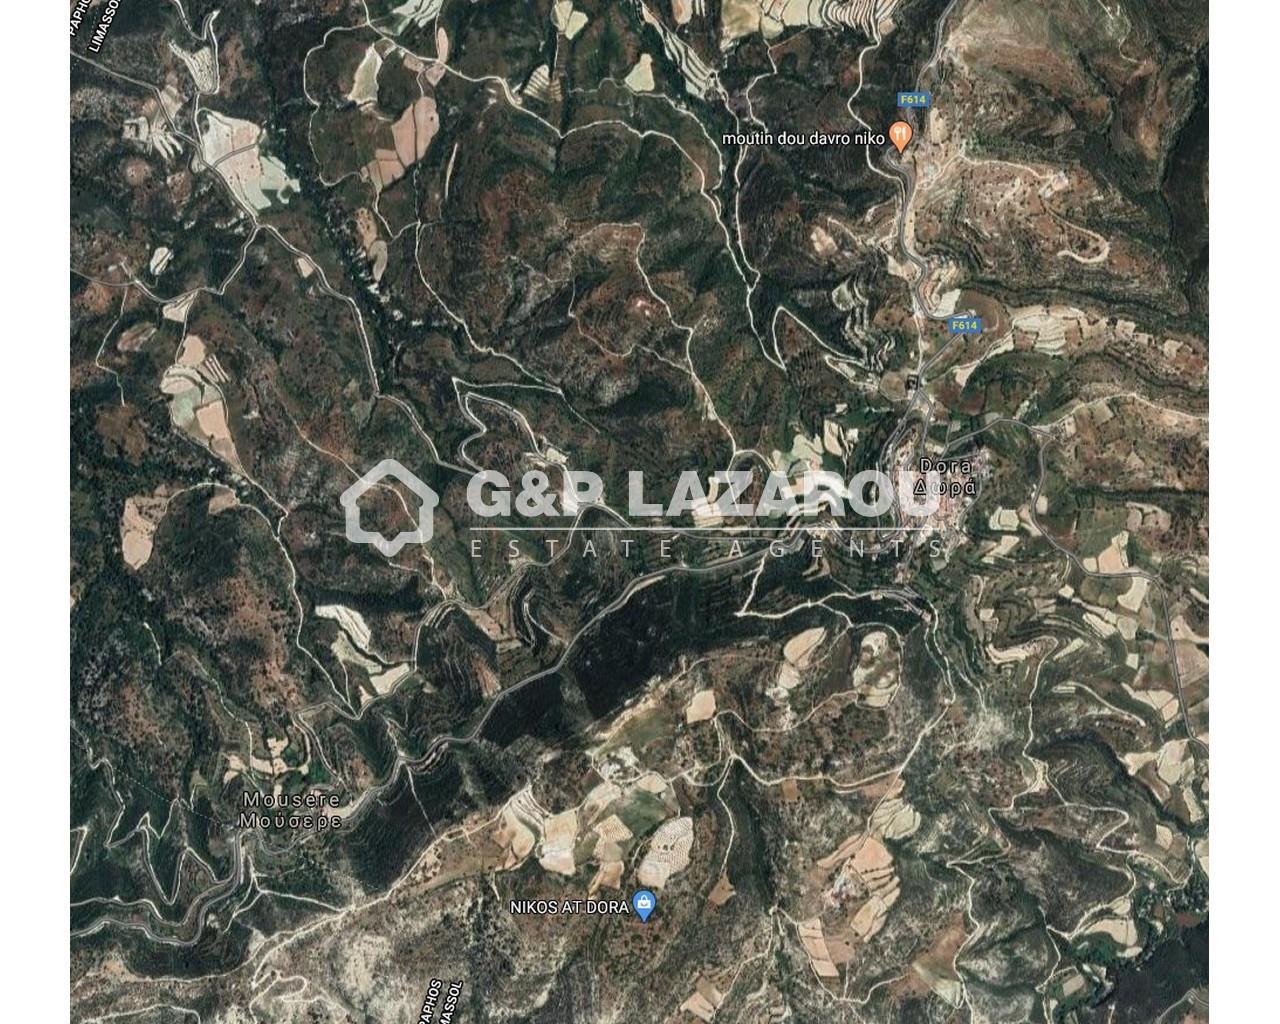 Land Limassol(Dora)  2676 SqMt for sale